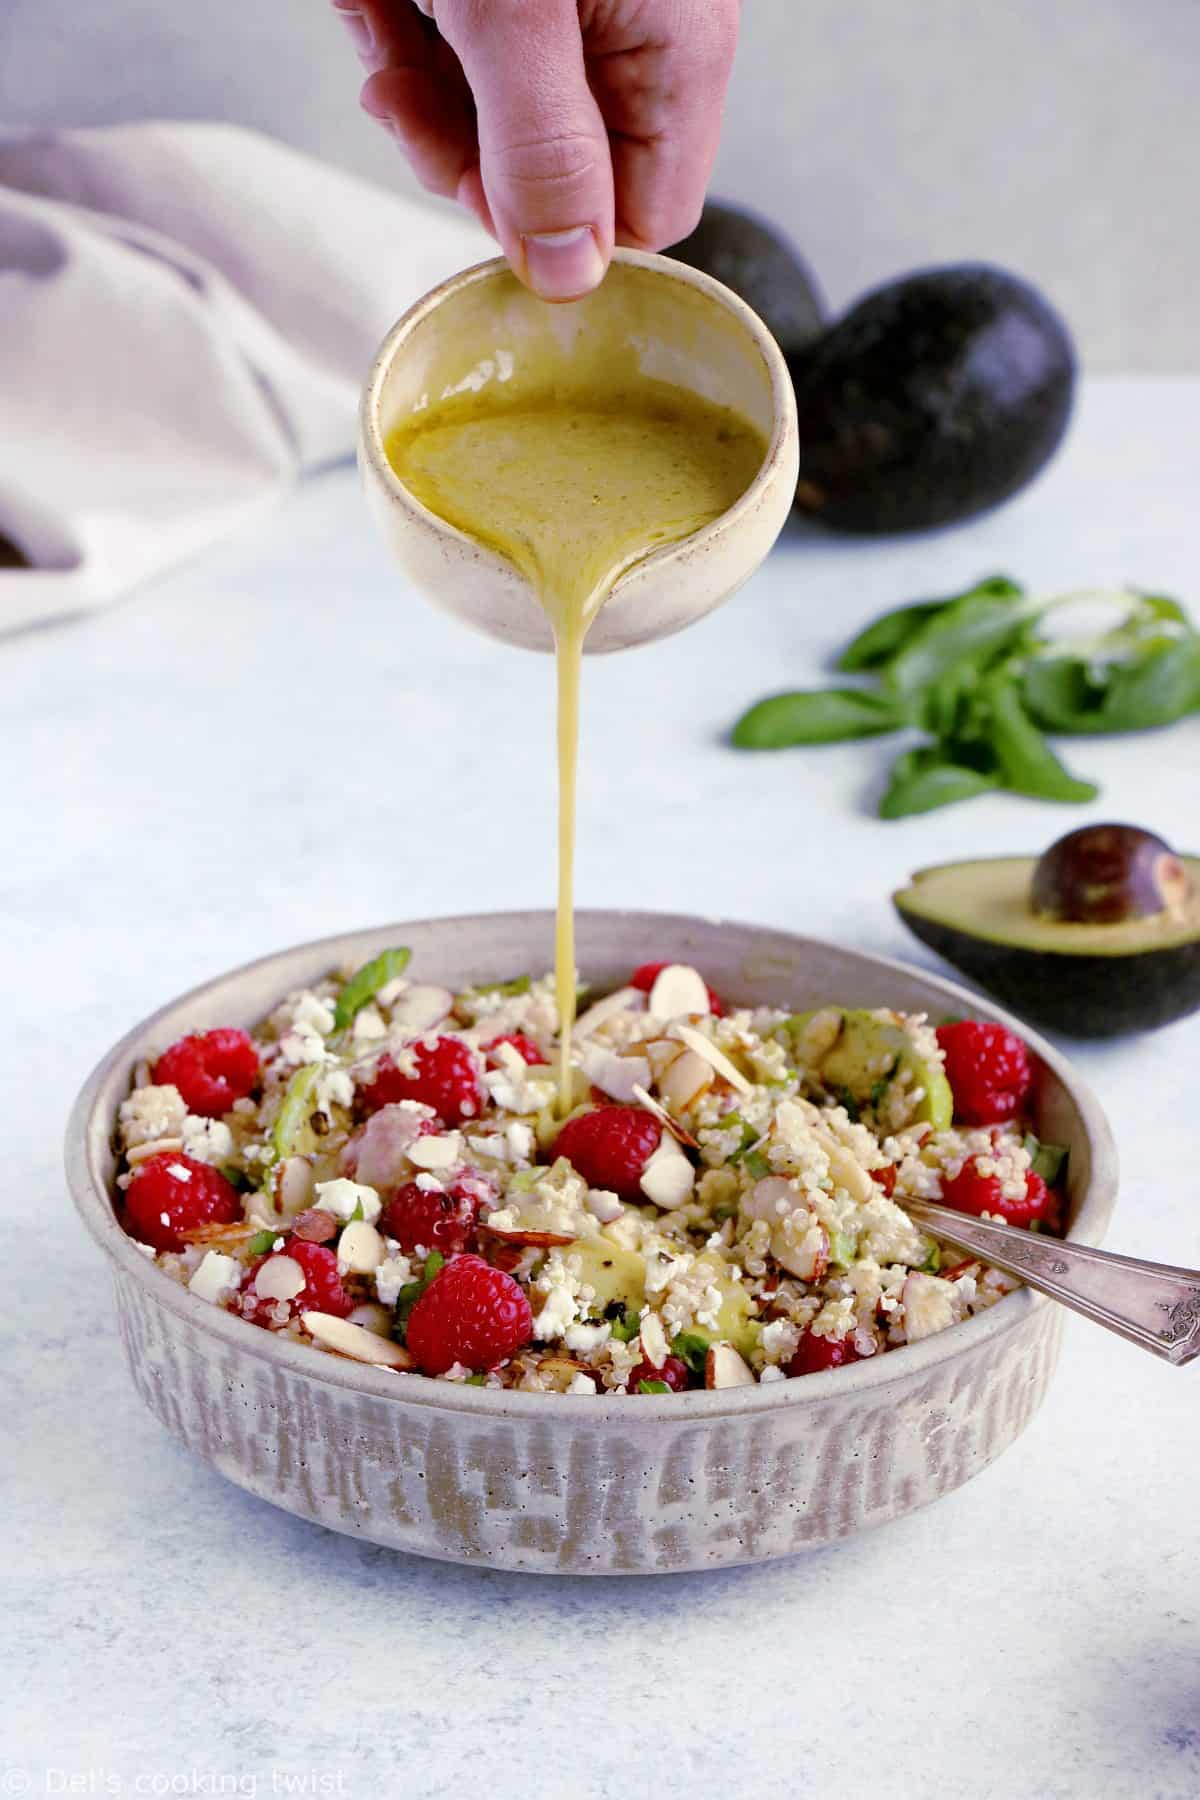 Salade de quinoa, avocat et framboises